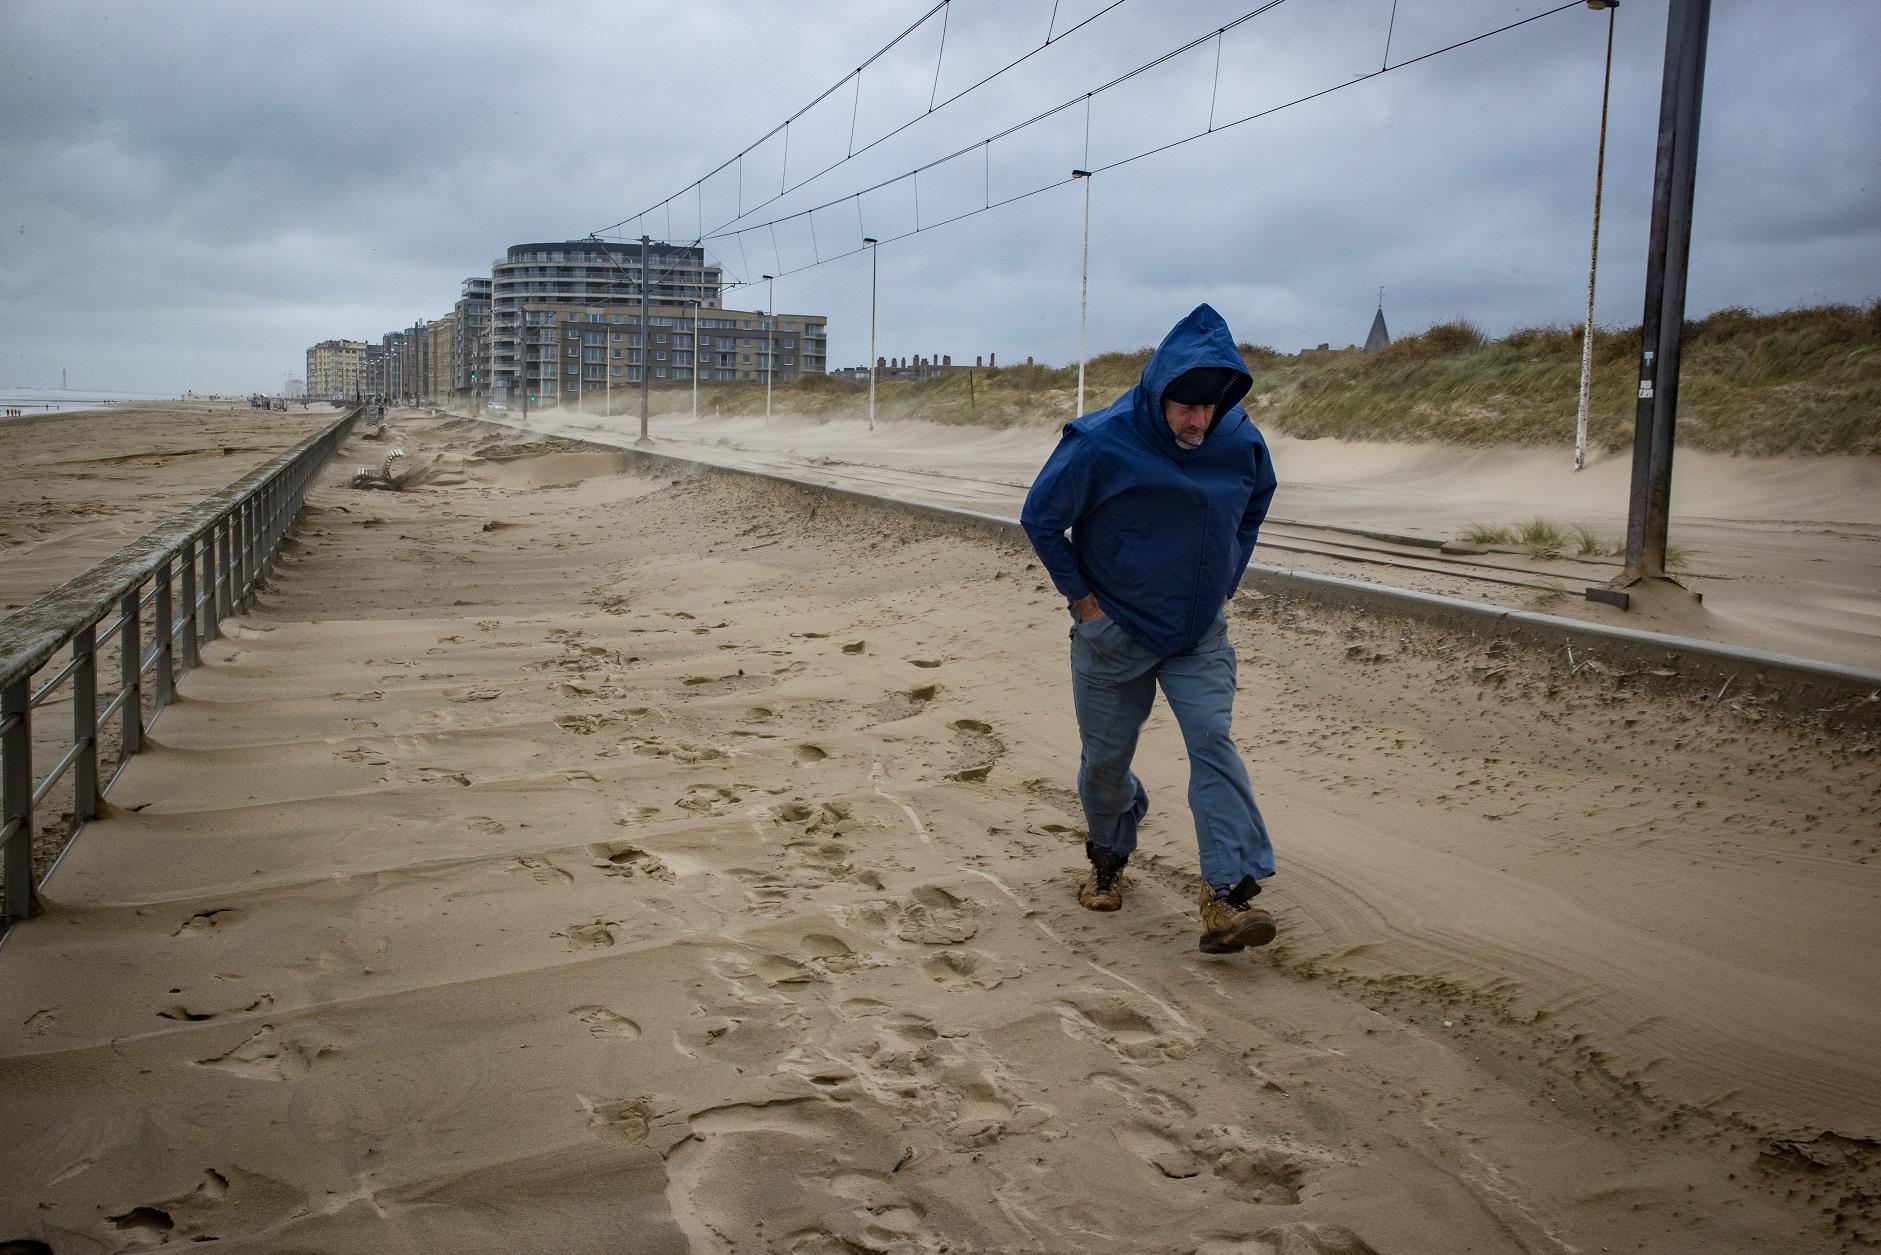 Storm Odette wreaks havoc in East and West Flanders